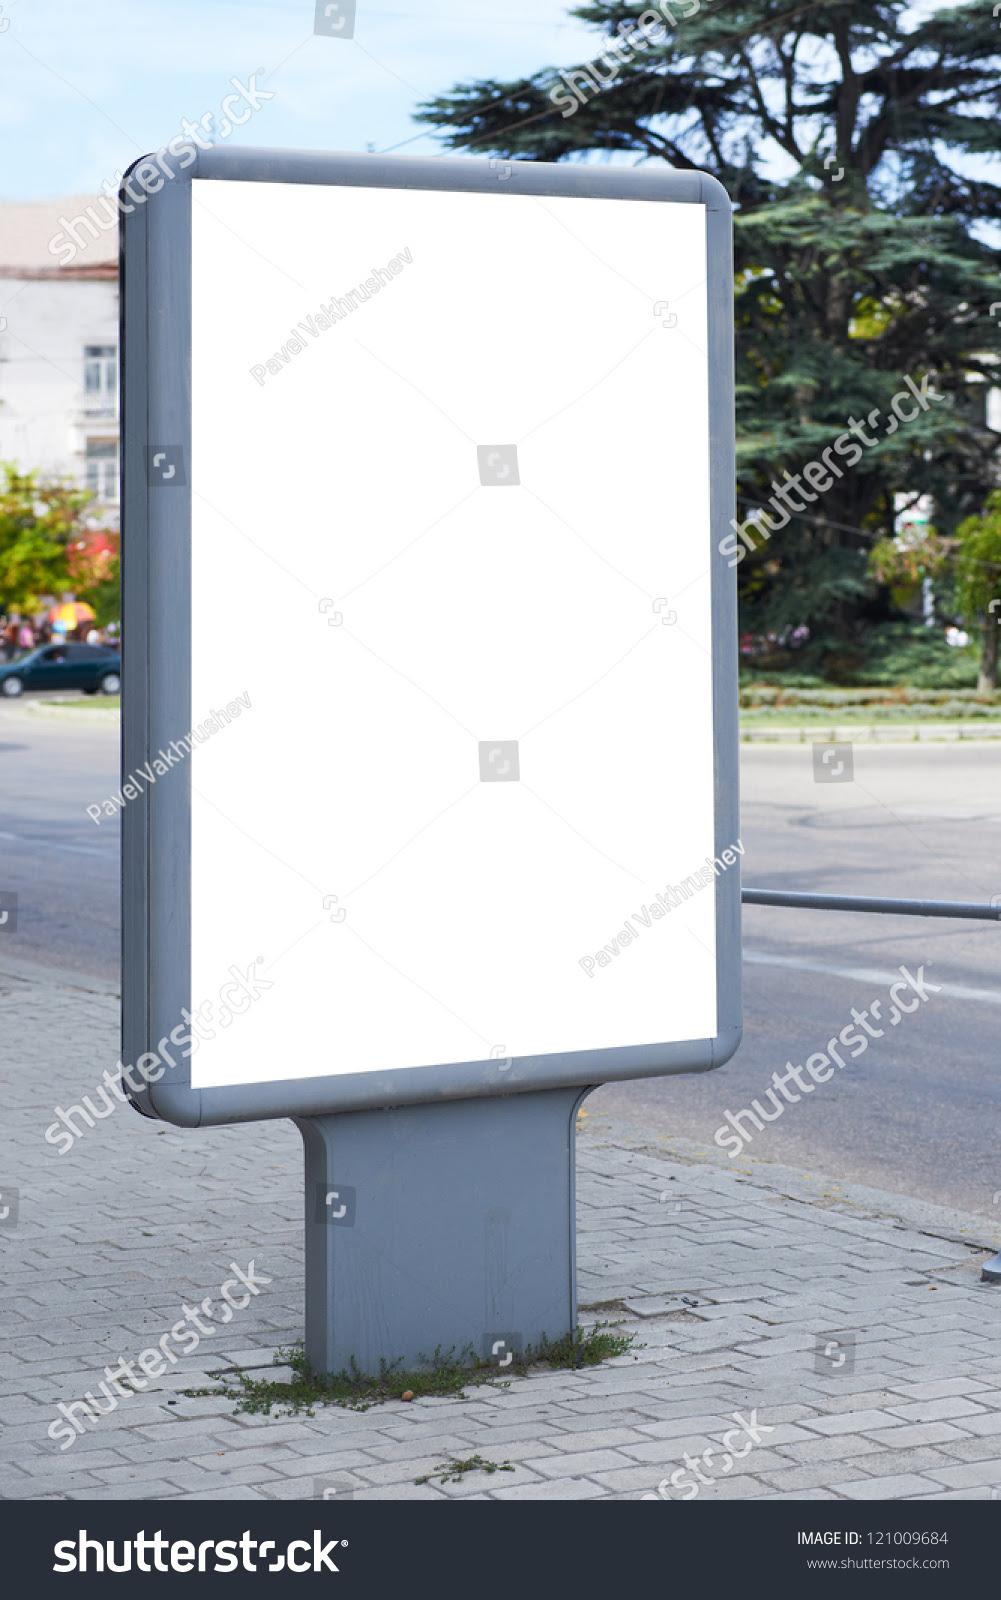 Vertical Blank Billboard On City Street Stock Photo 121009684 ...